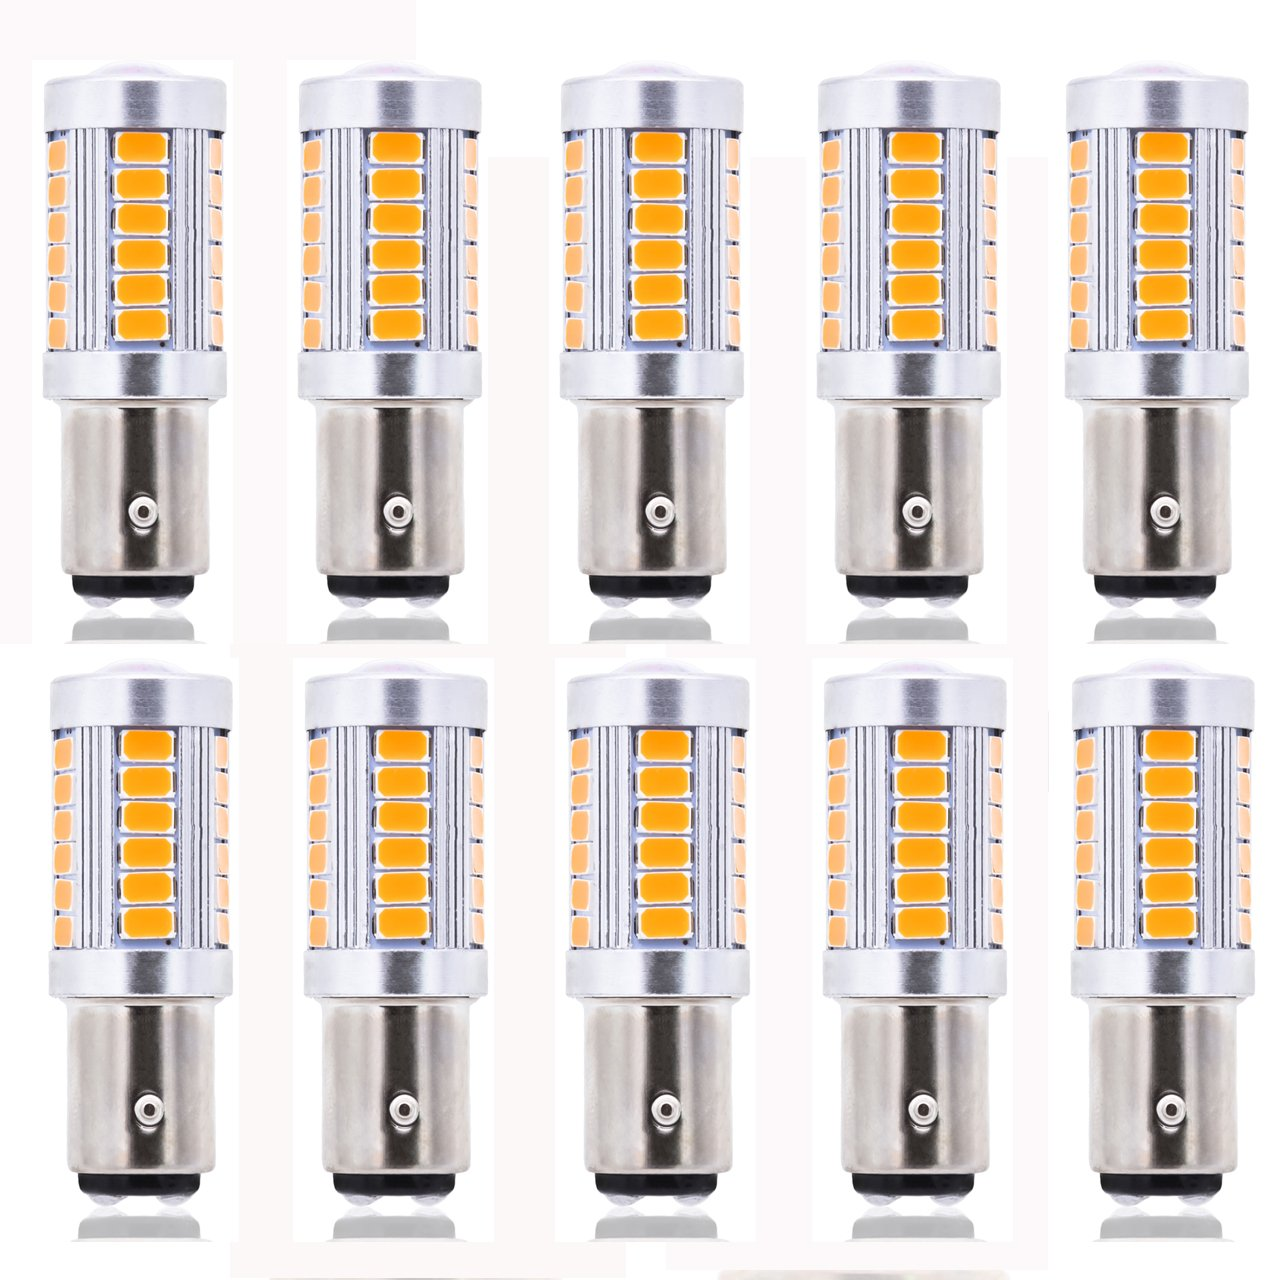 KATUR 4 x Amber 1157 S25 BAY15D 1210 54-SMD LED Car Lights Bulb Backup Signal Blinker Tail Light Bulbs 12V Replacement 1016 1034 2057 7528 1157A 1178A LED Light